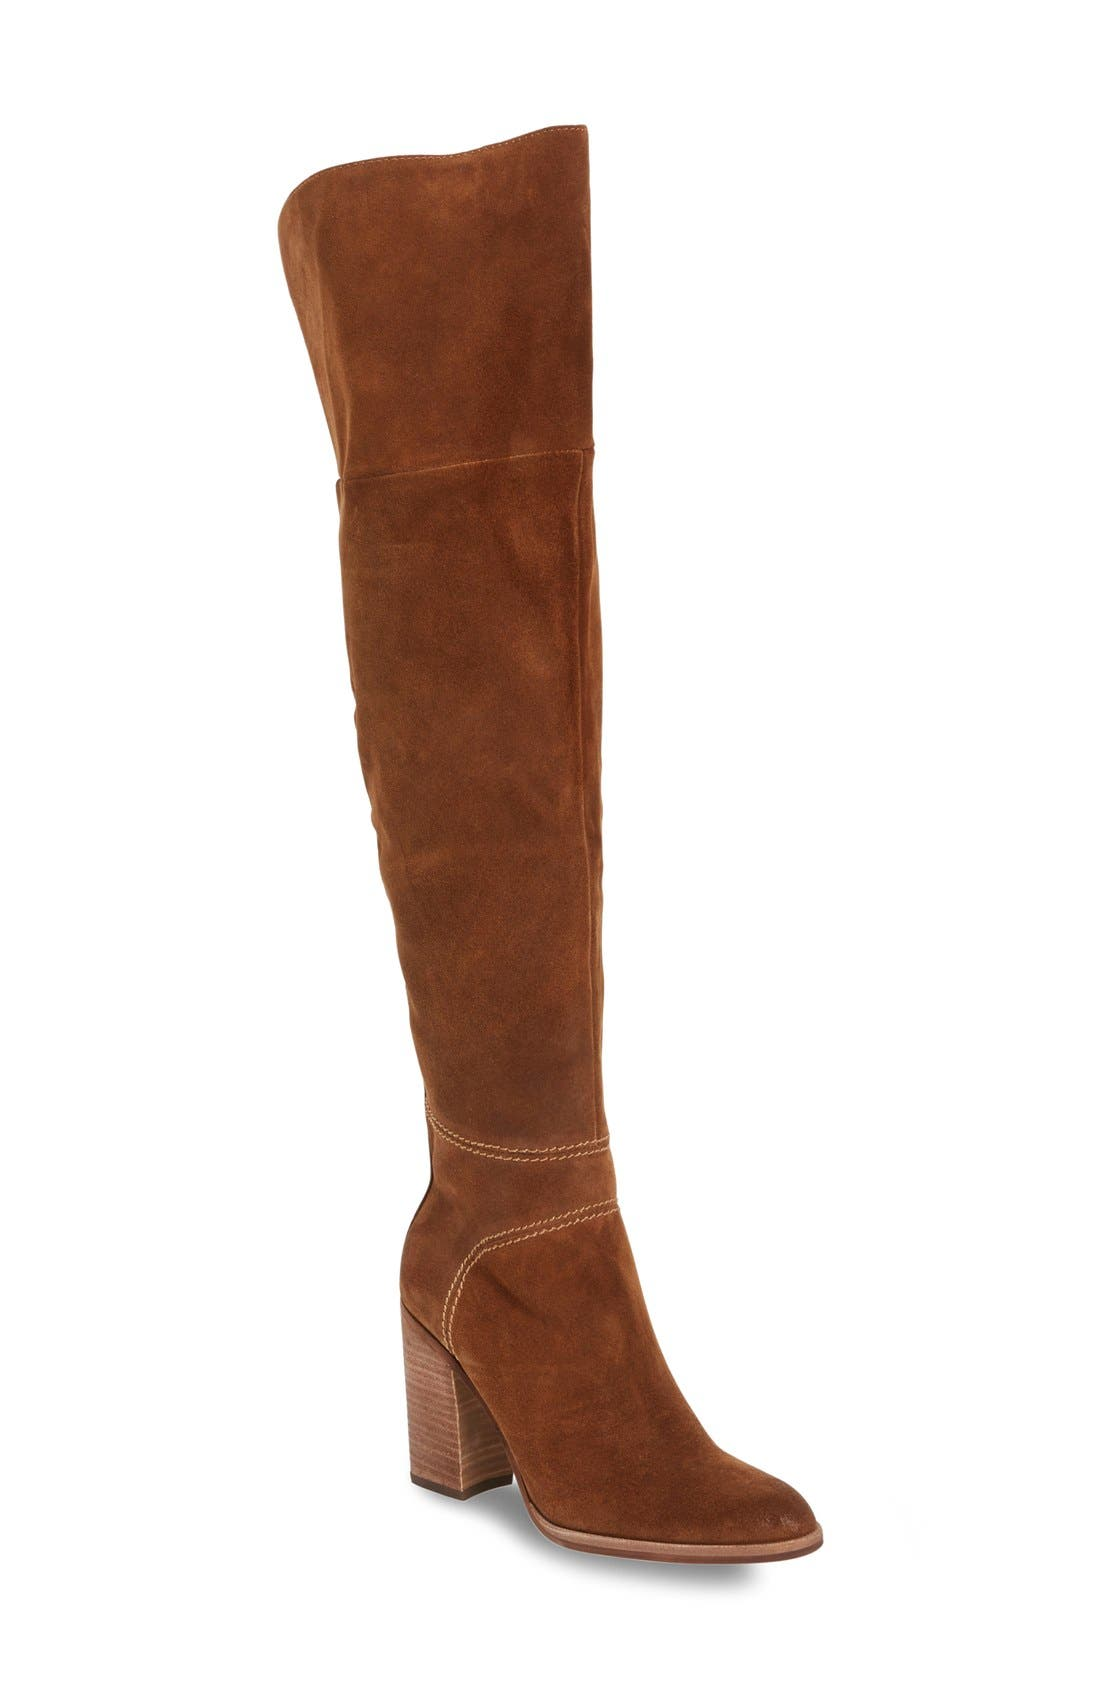 Main Image - Dolce Vita 'Cash' Over the Knee Boot (Women)